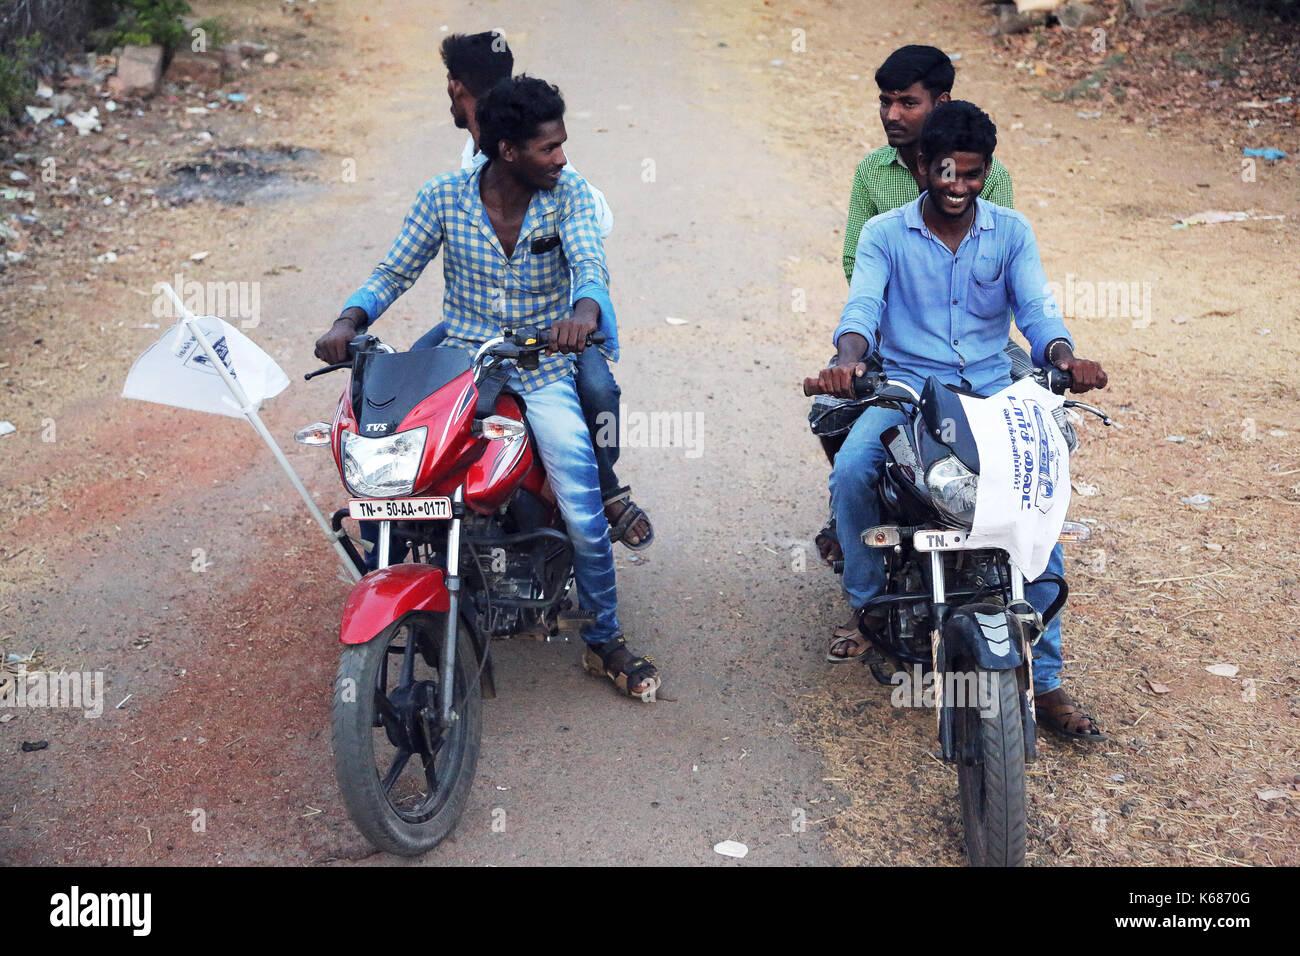 Image result for imagen muchachos en moto iNDIA